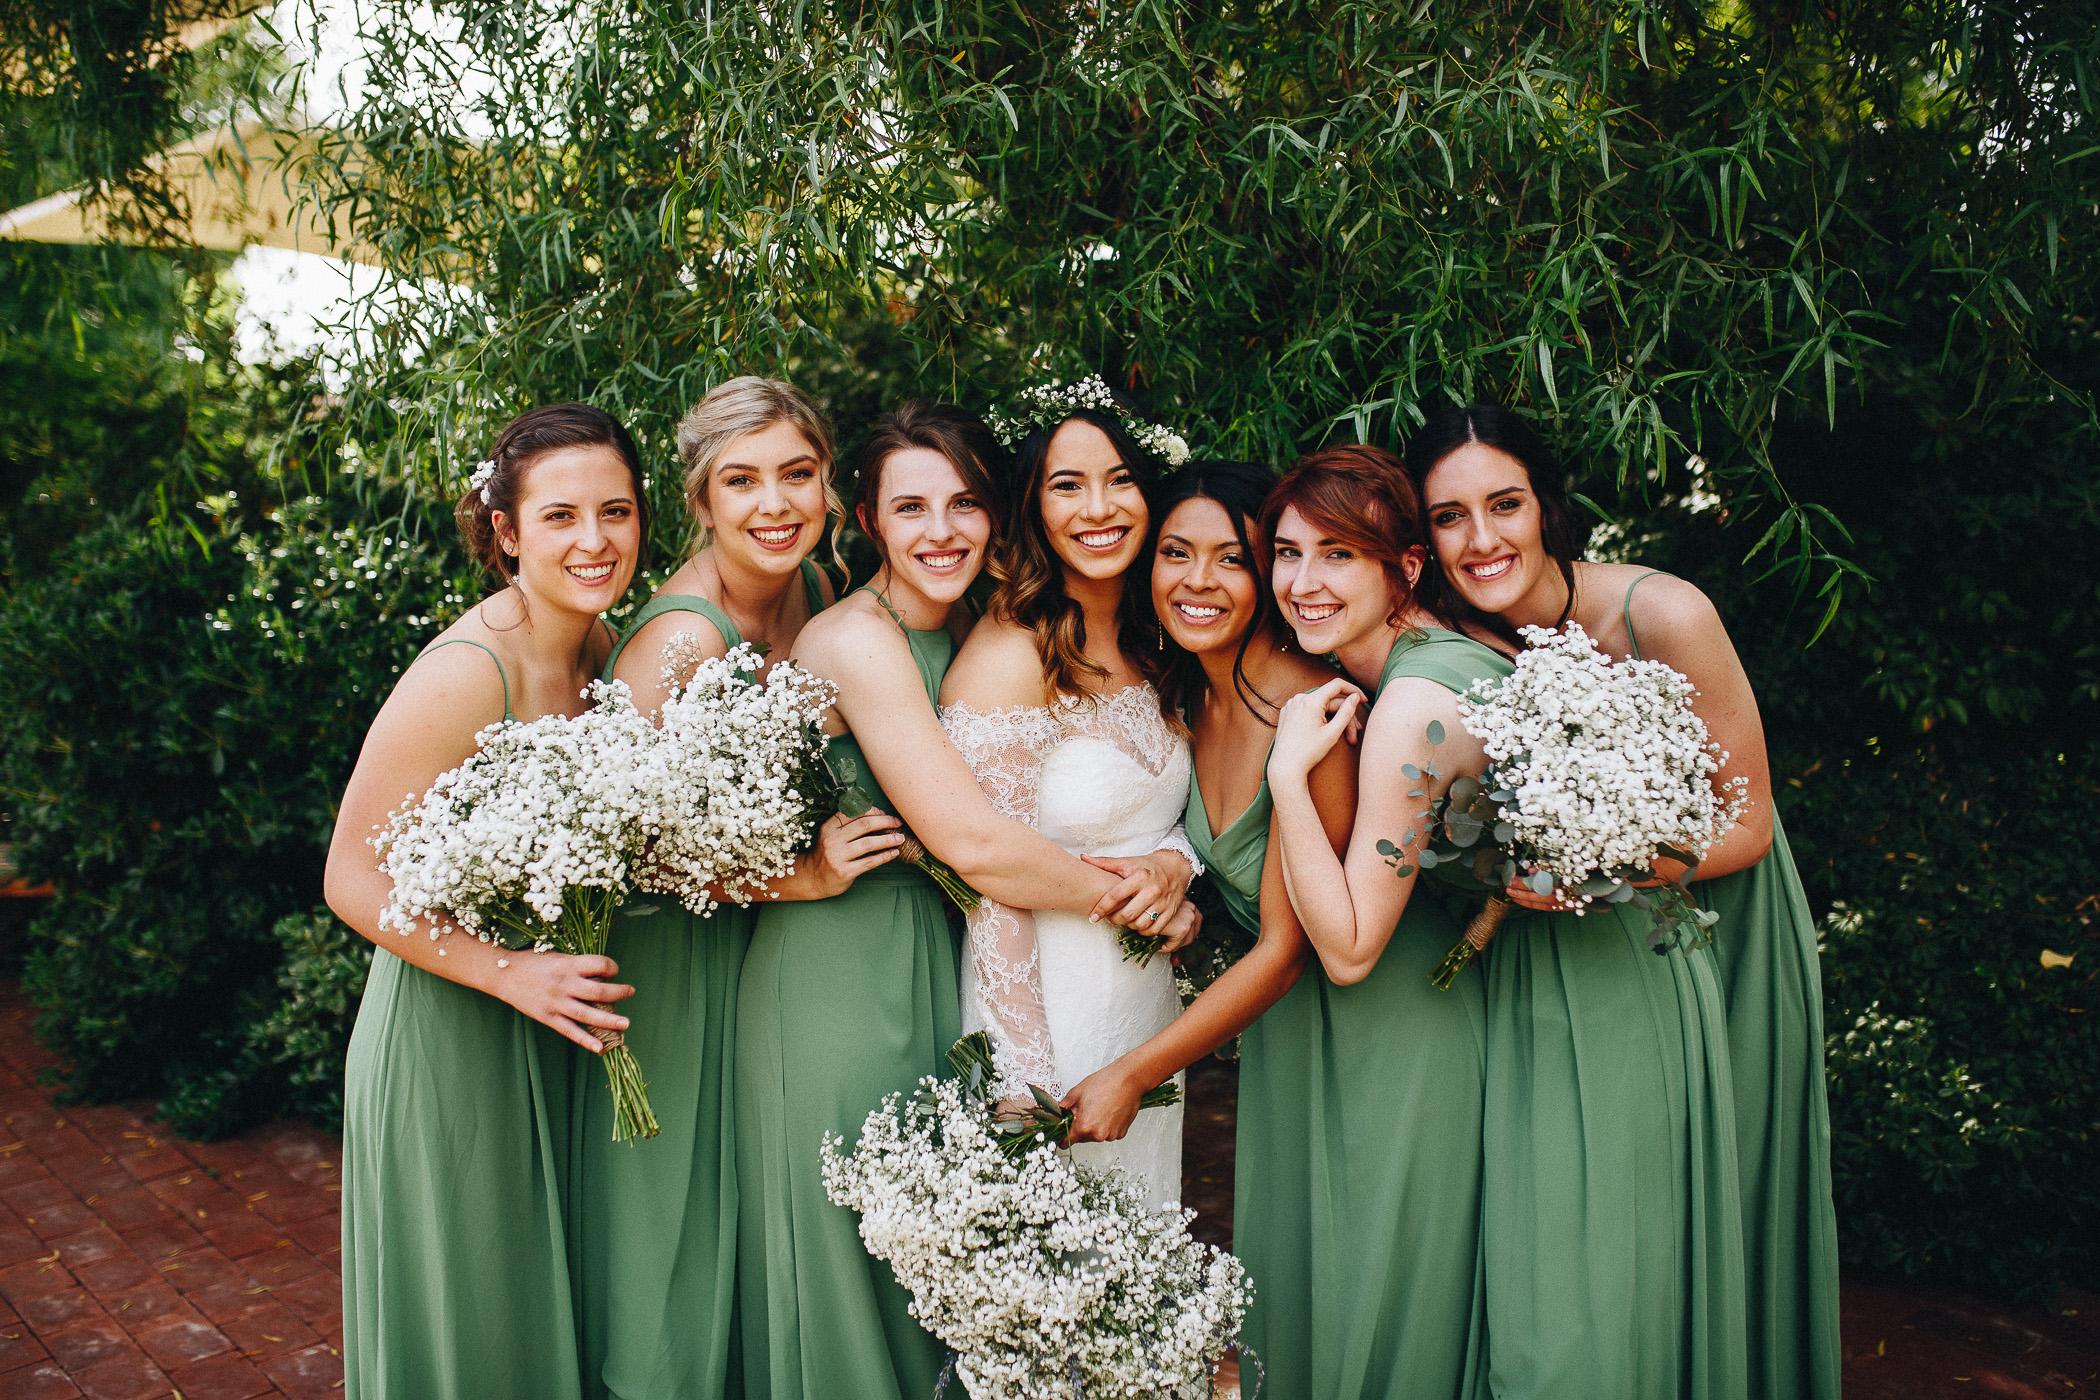 181104-Luxium-Weddings-Arizona-@matt__Le-Brandon-Kariana-Phoenix-Valley-Garden-Center-1017.jpg